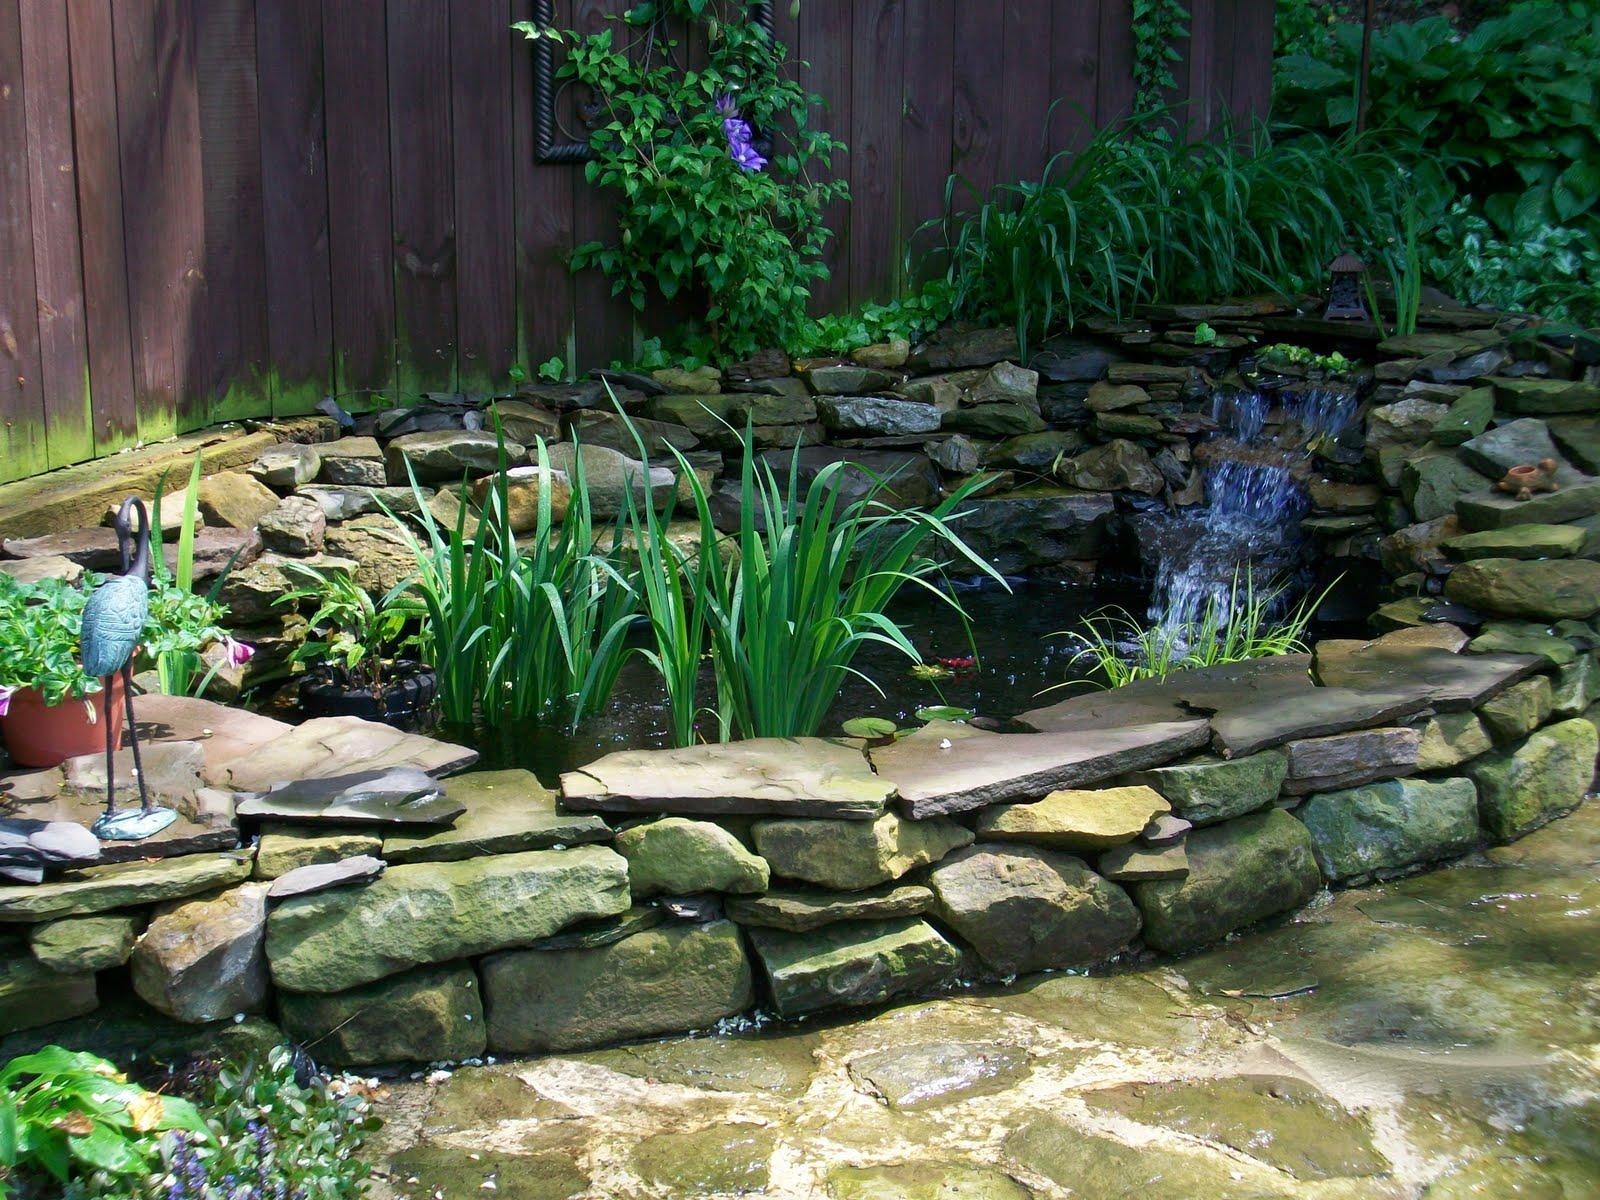 Building a backyard pond using a pond kit.: Building a ...